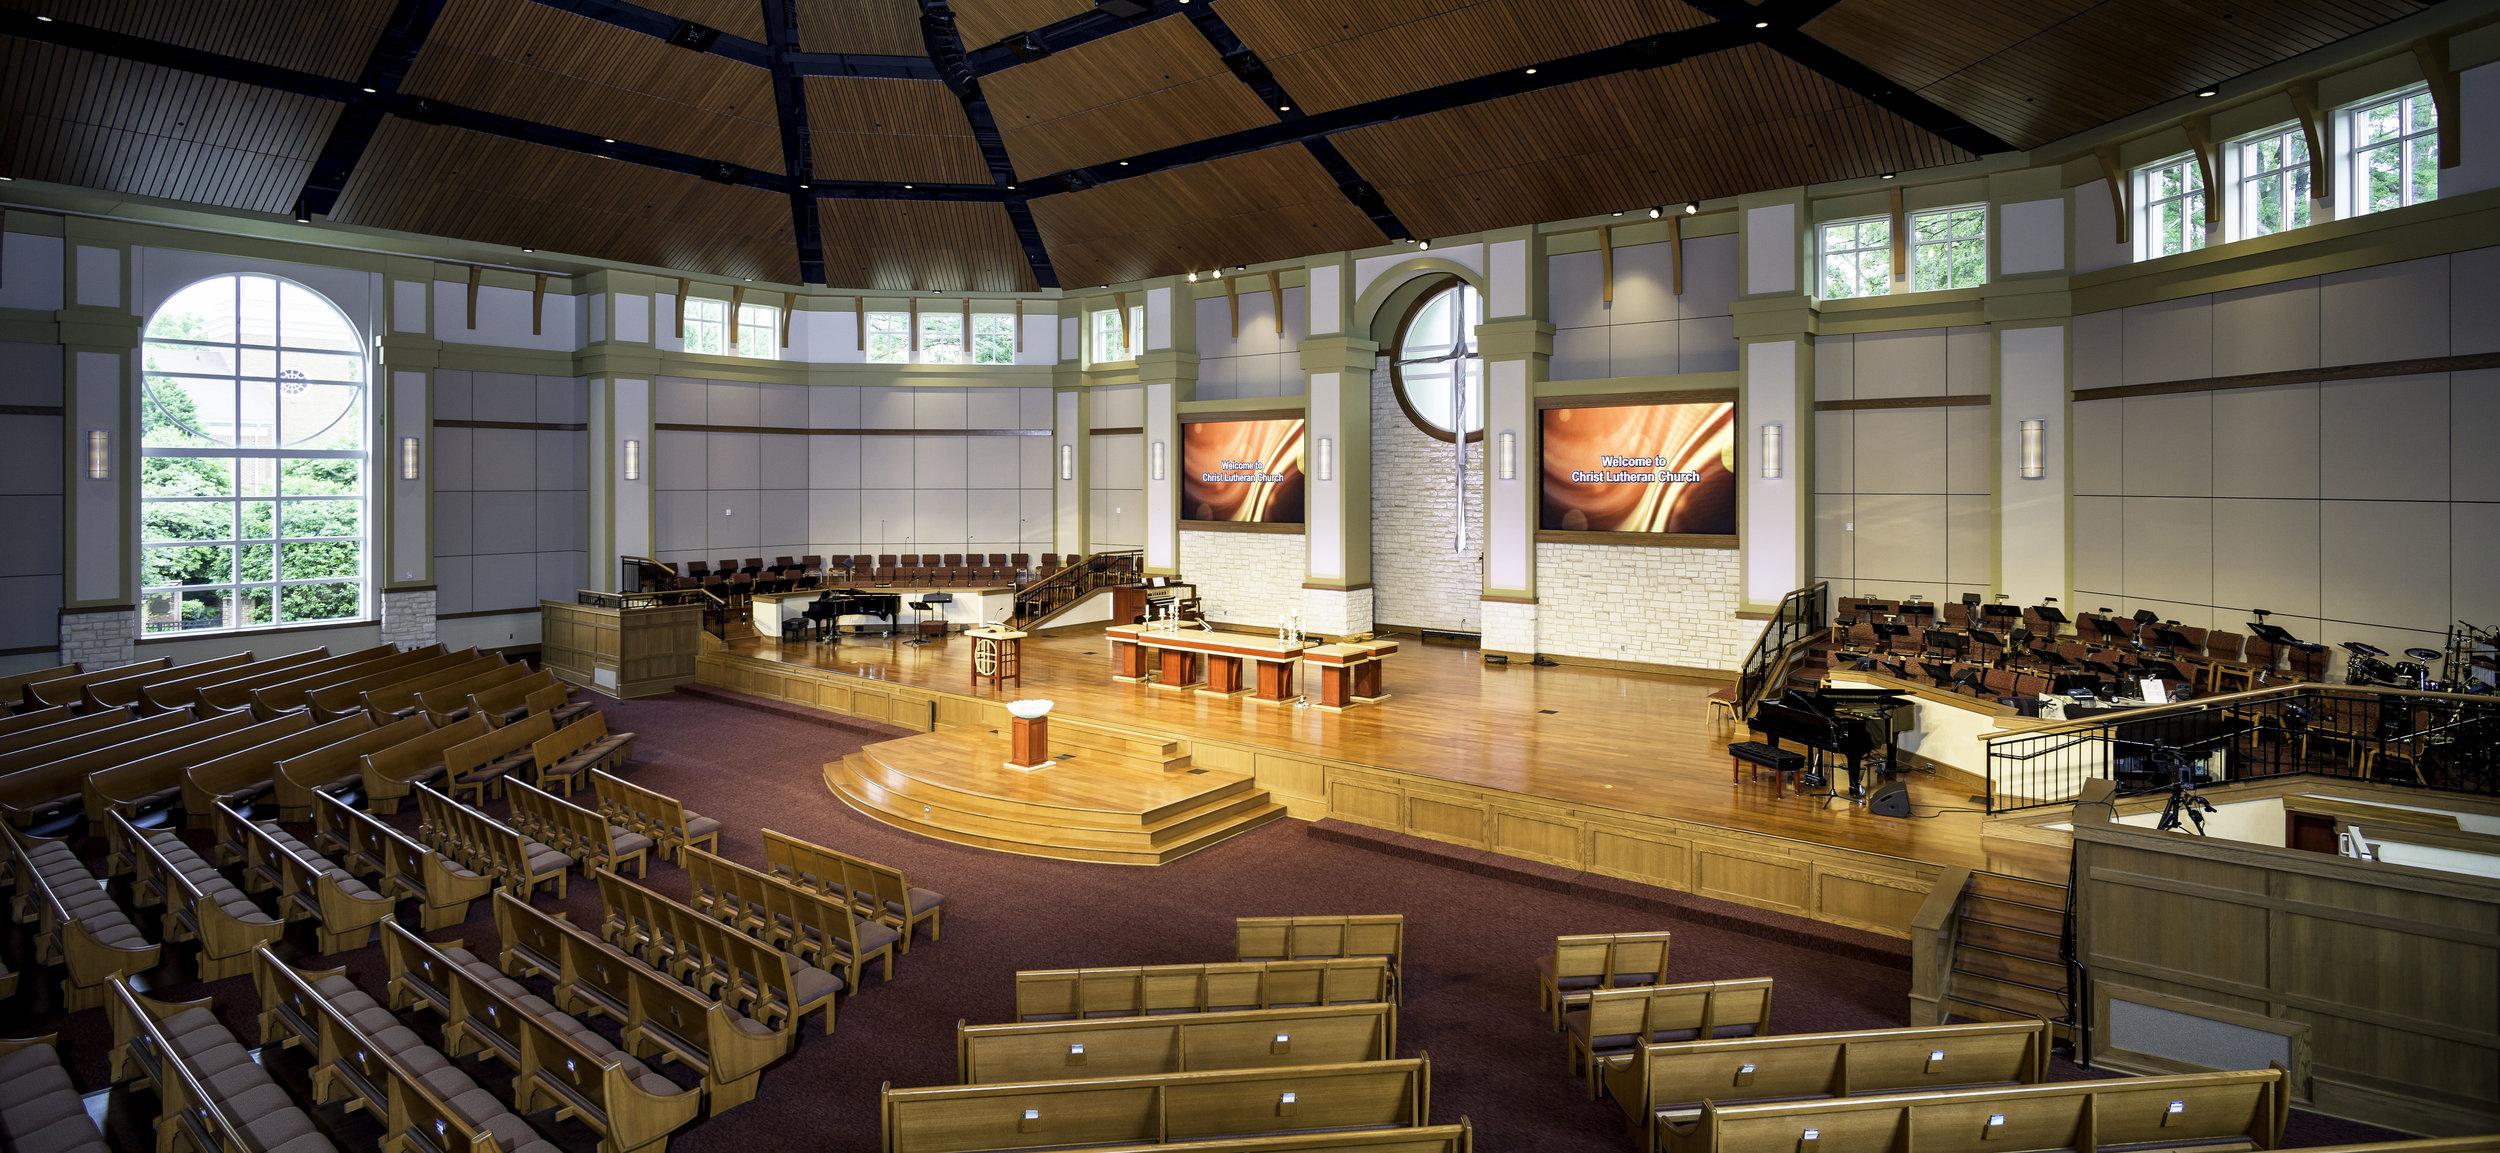 ADW-Faith-Based-Christ-Lutheran-Charlotte-NC-Worship-2.jpg